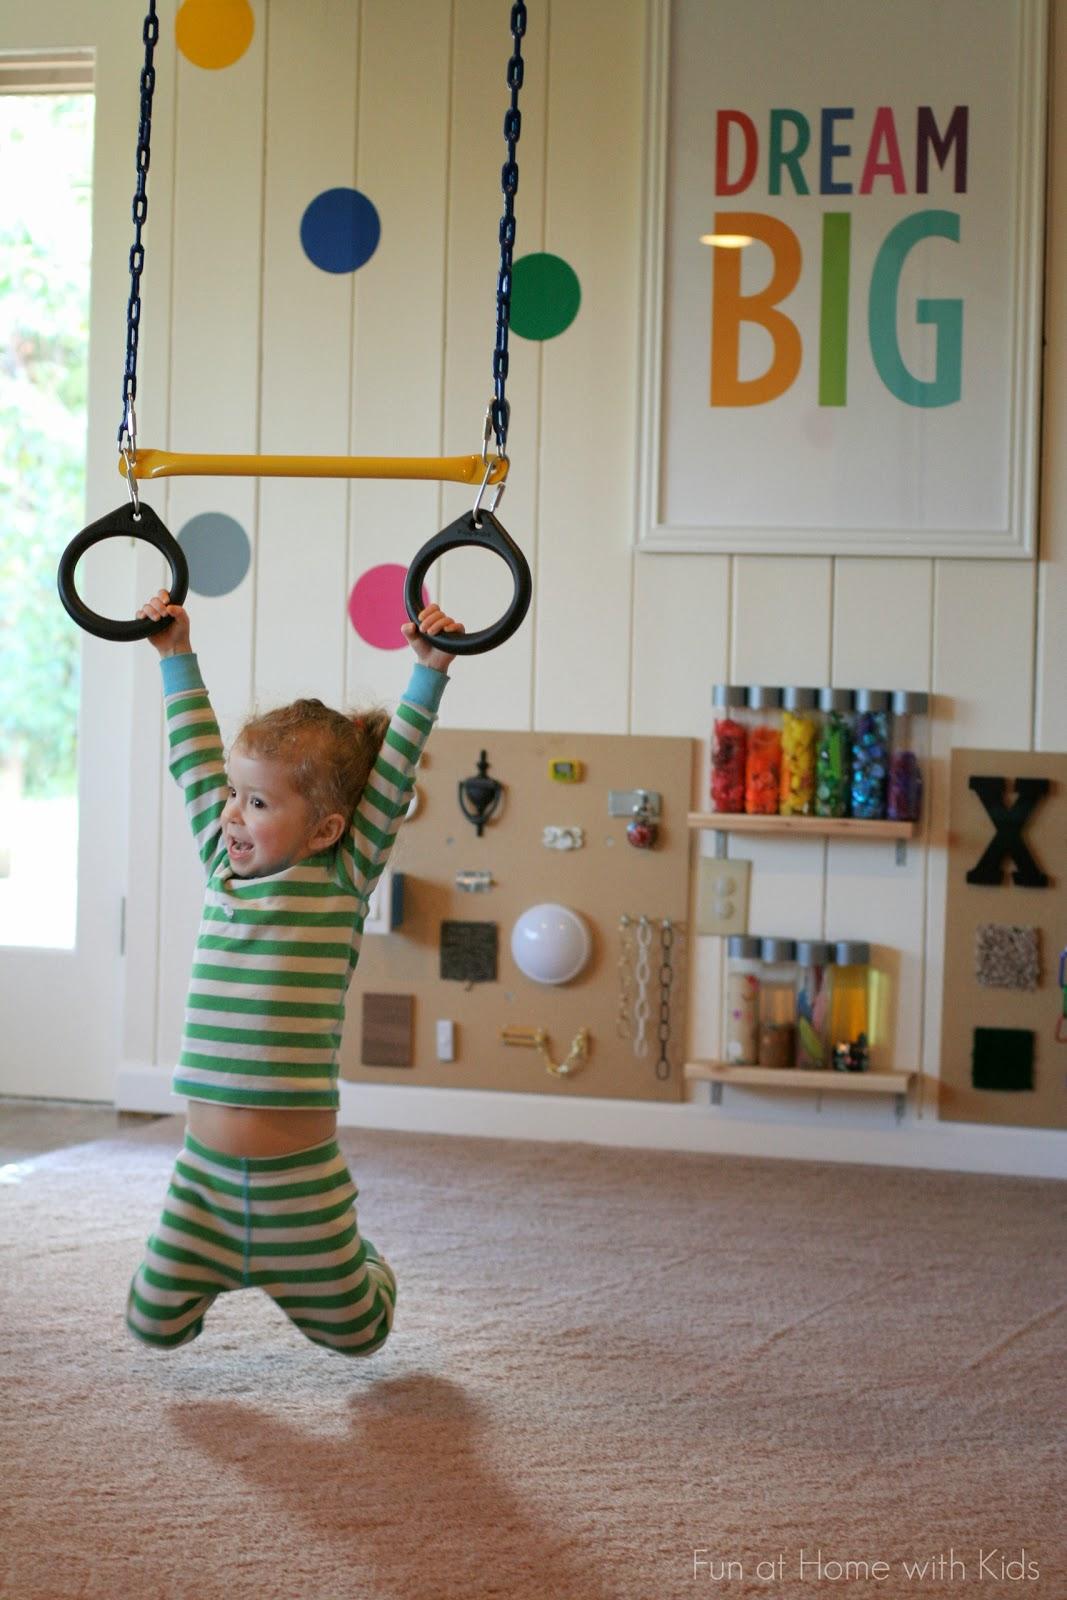 Playroom design diy playroom with rock wall - Kids play room ...